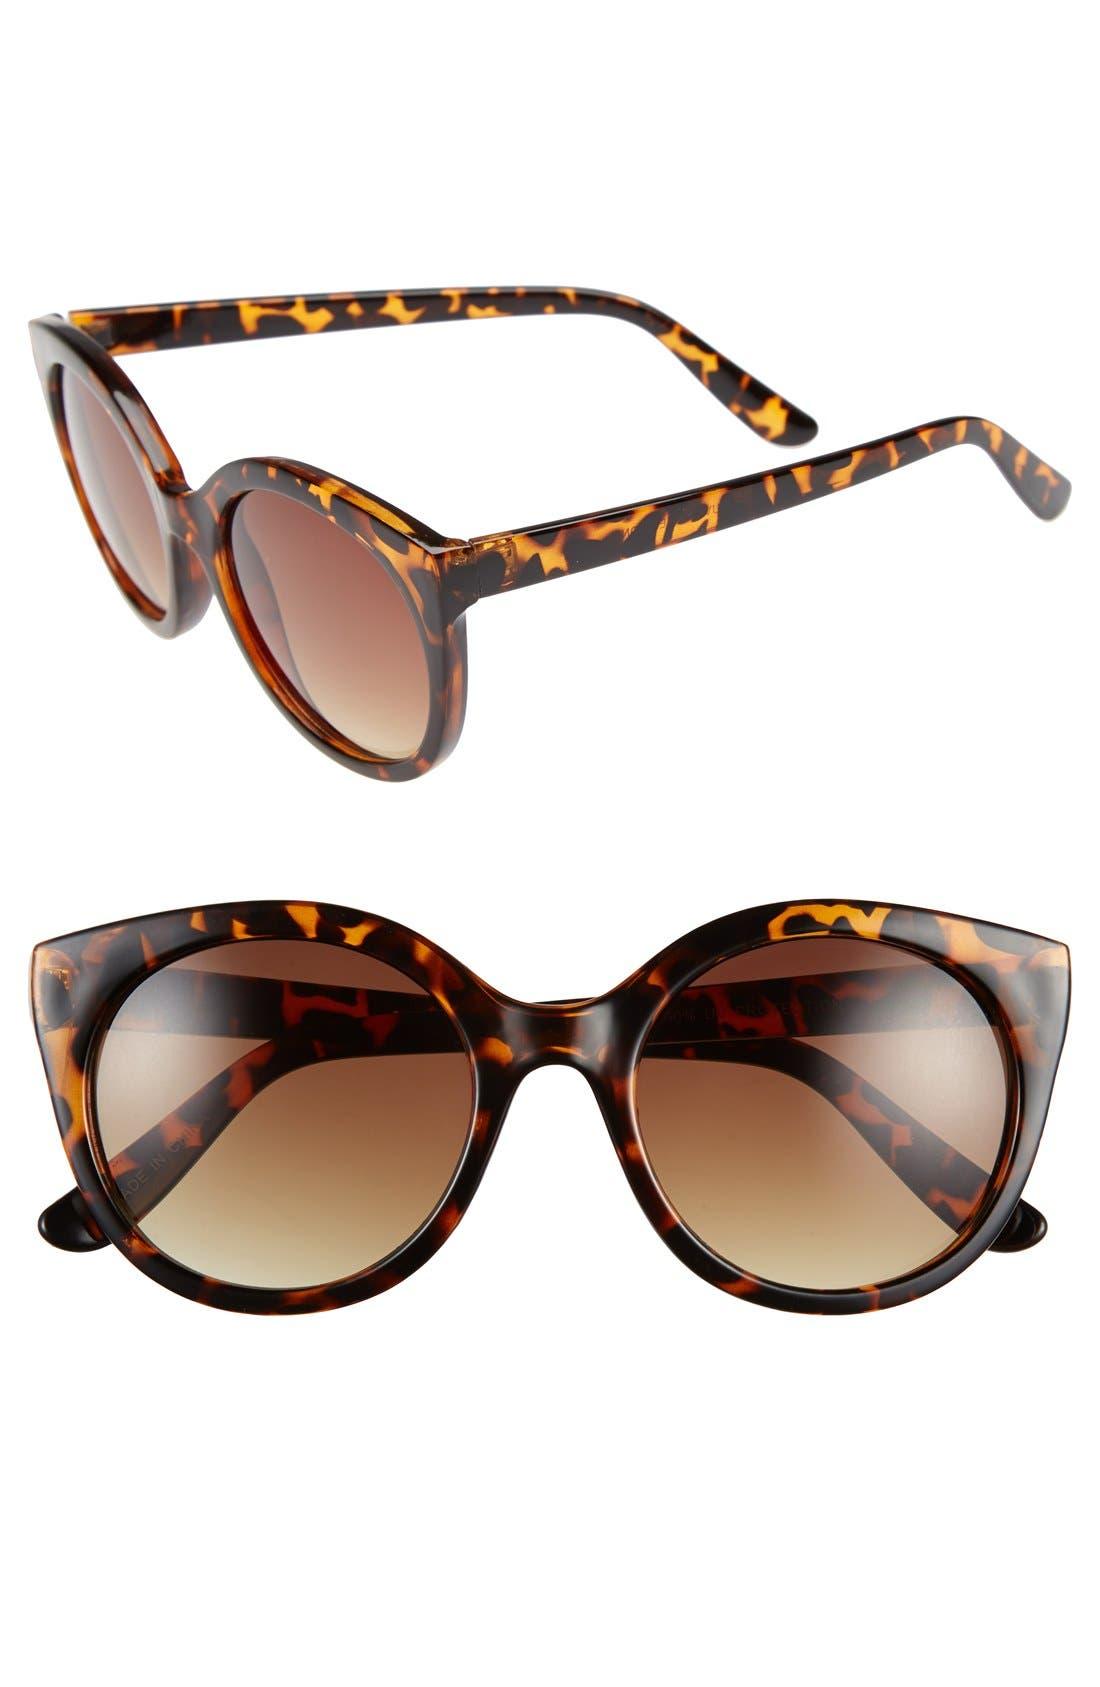 Alternate Image 1 Selected - BP. 60mm Retro Sunglasses